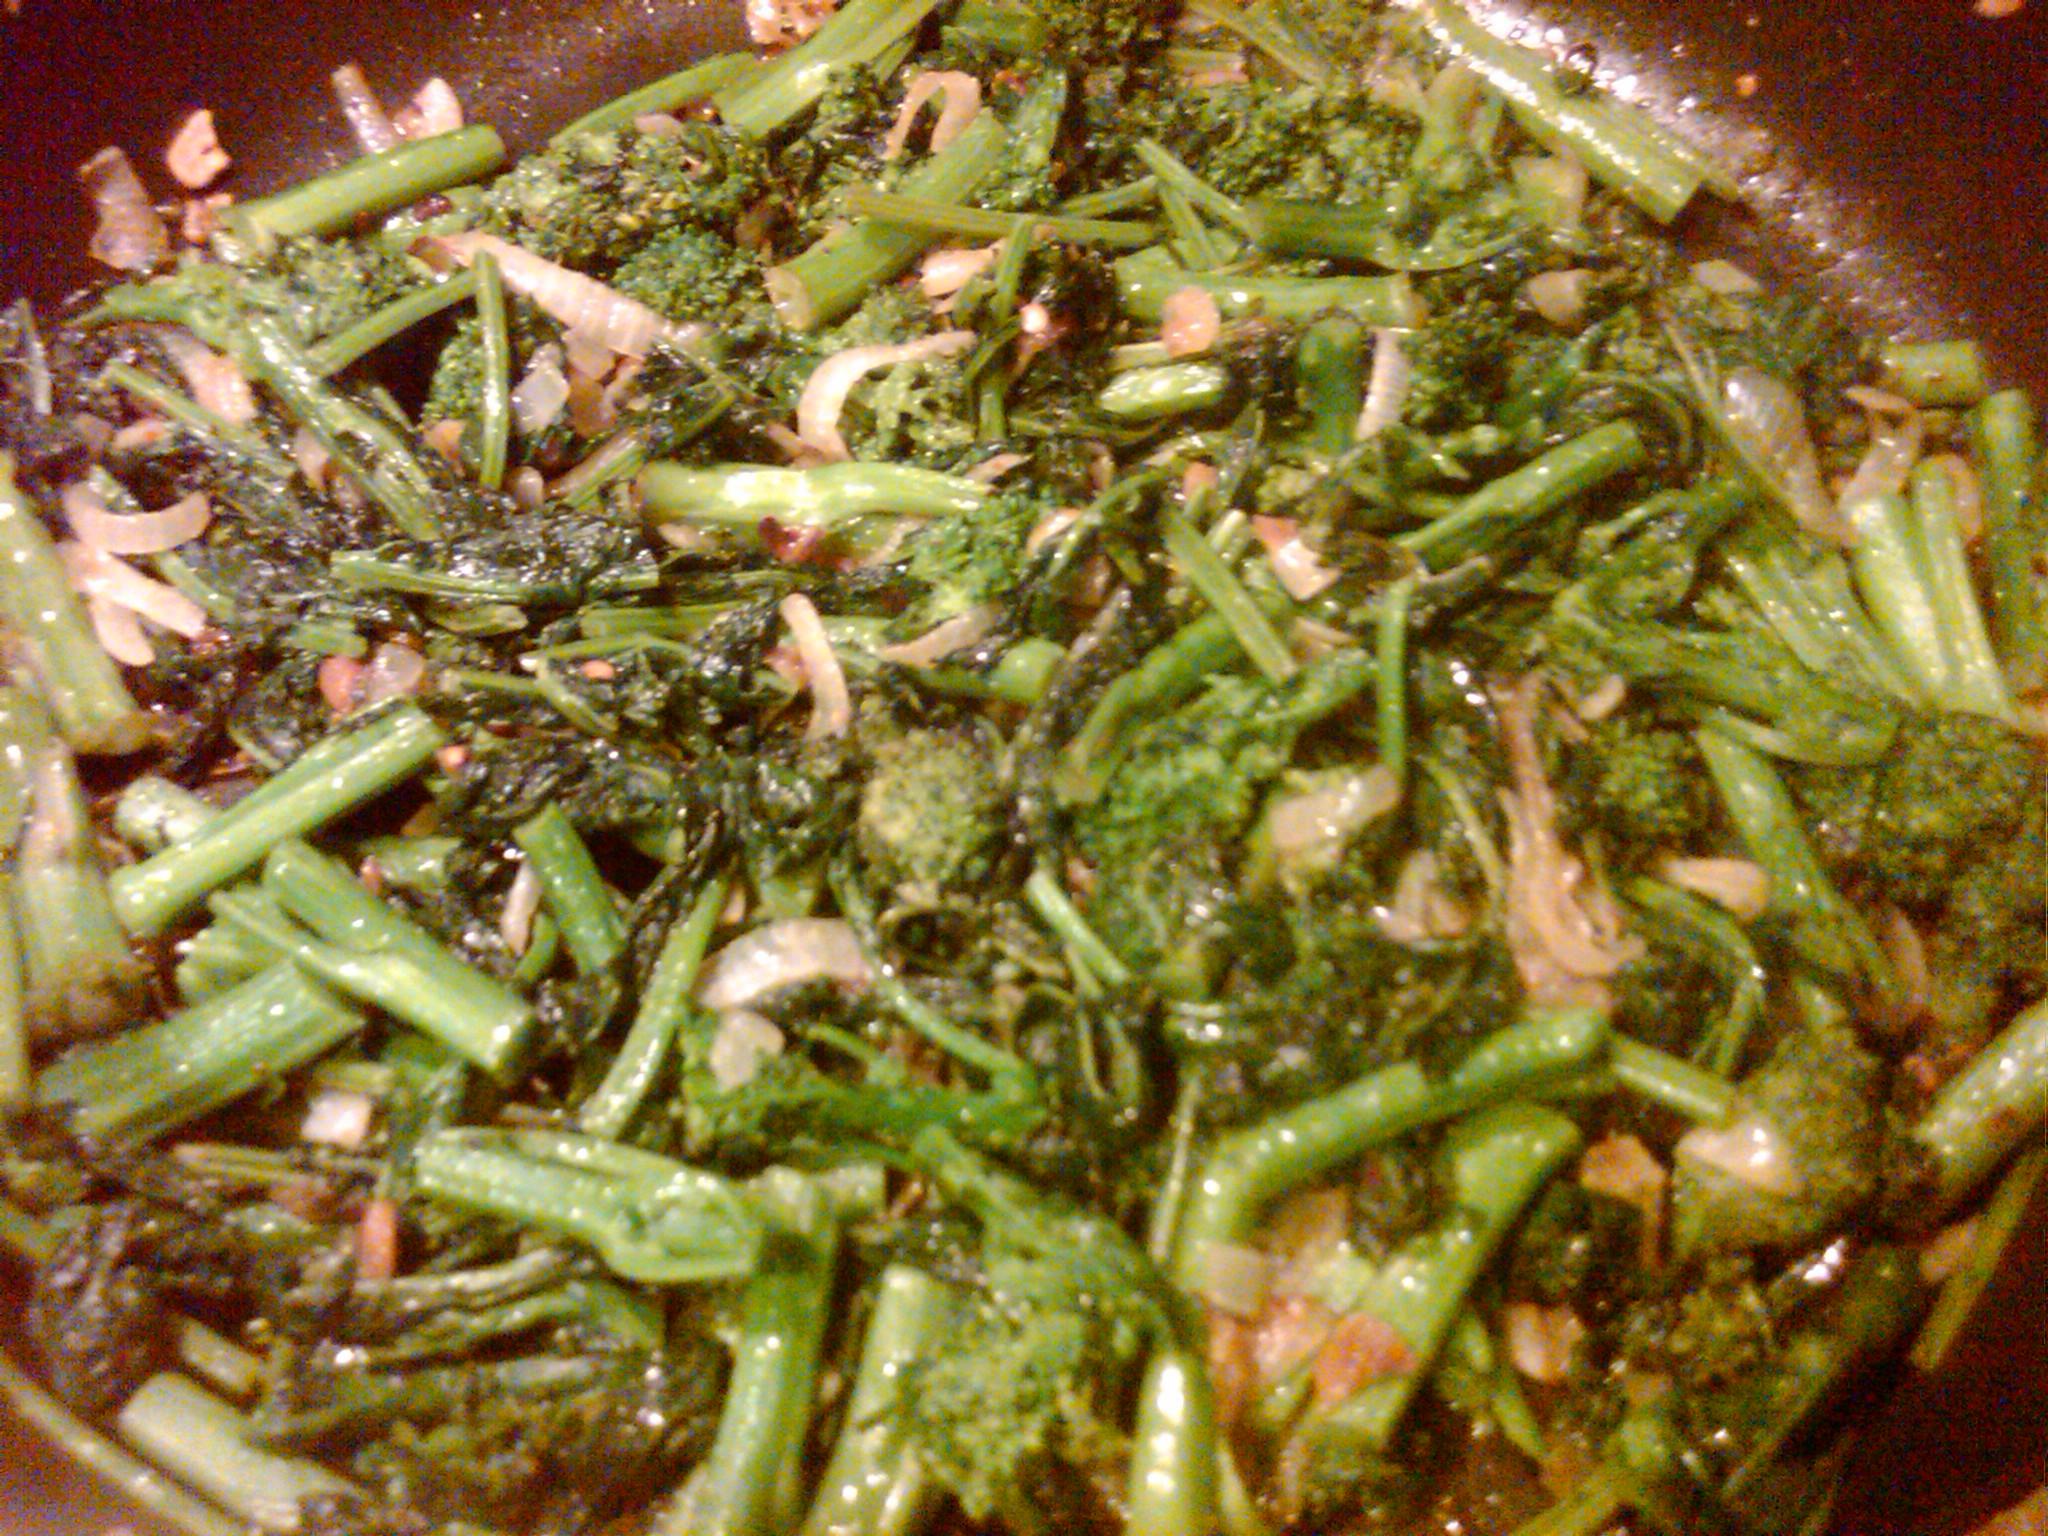 Broccoli Rabe With Caramelized Onions Recipes — Dishmaps